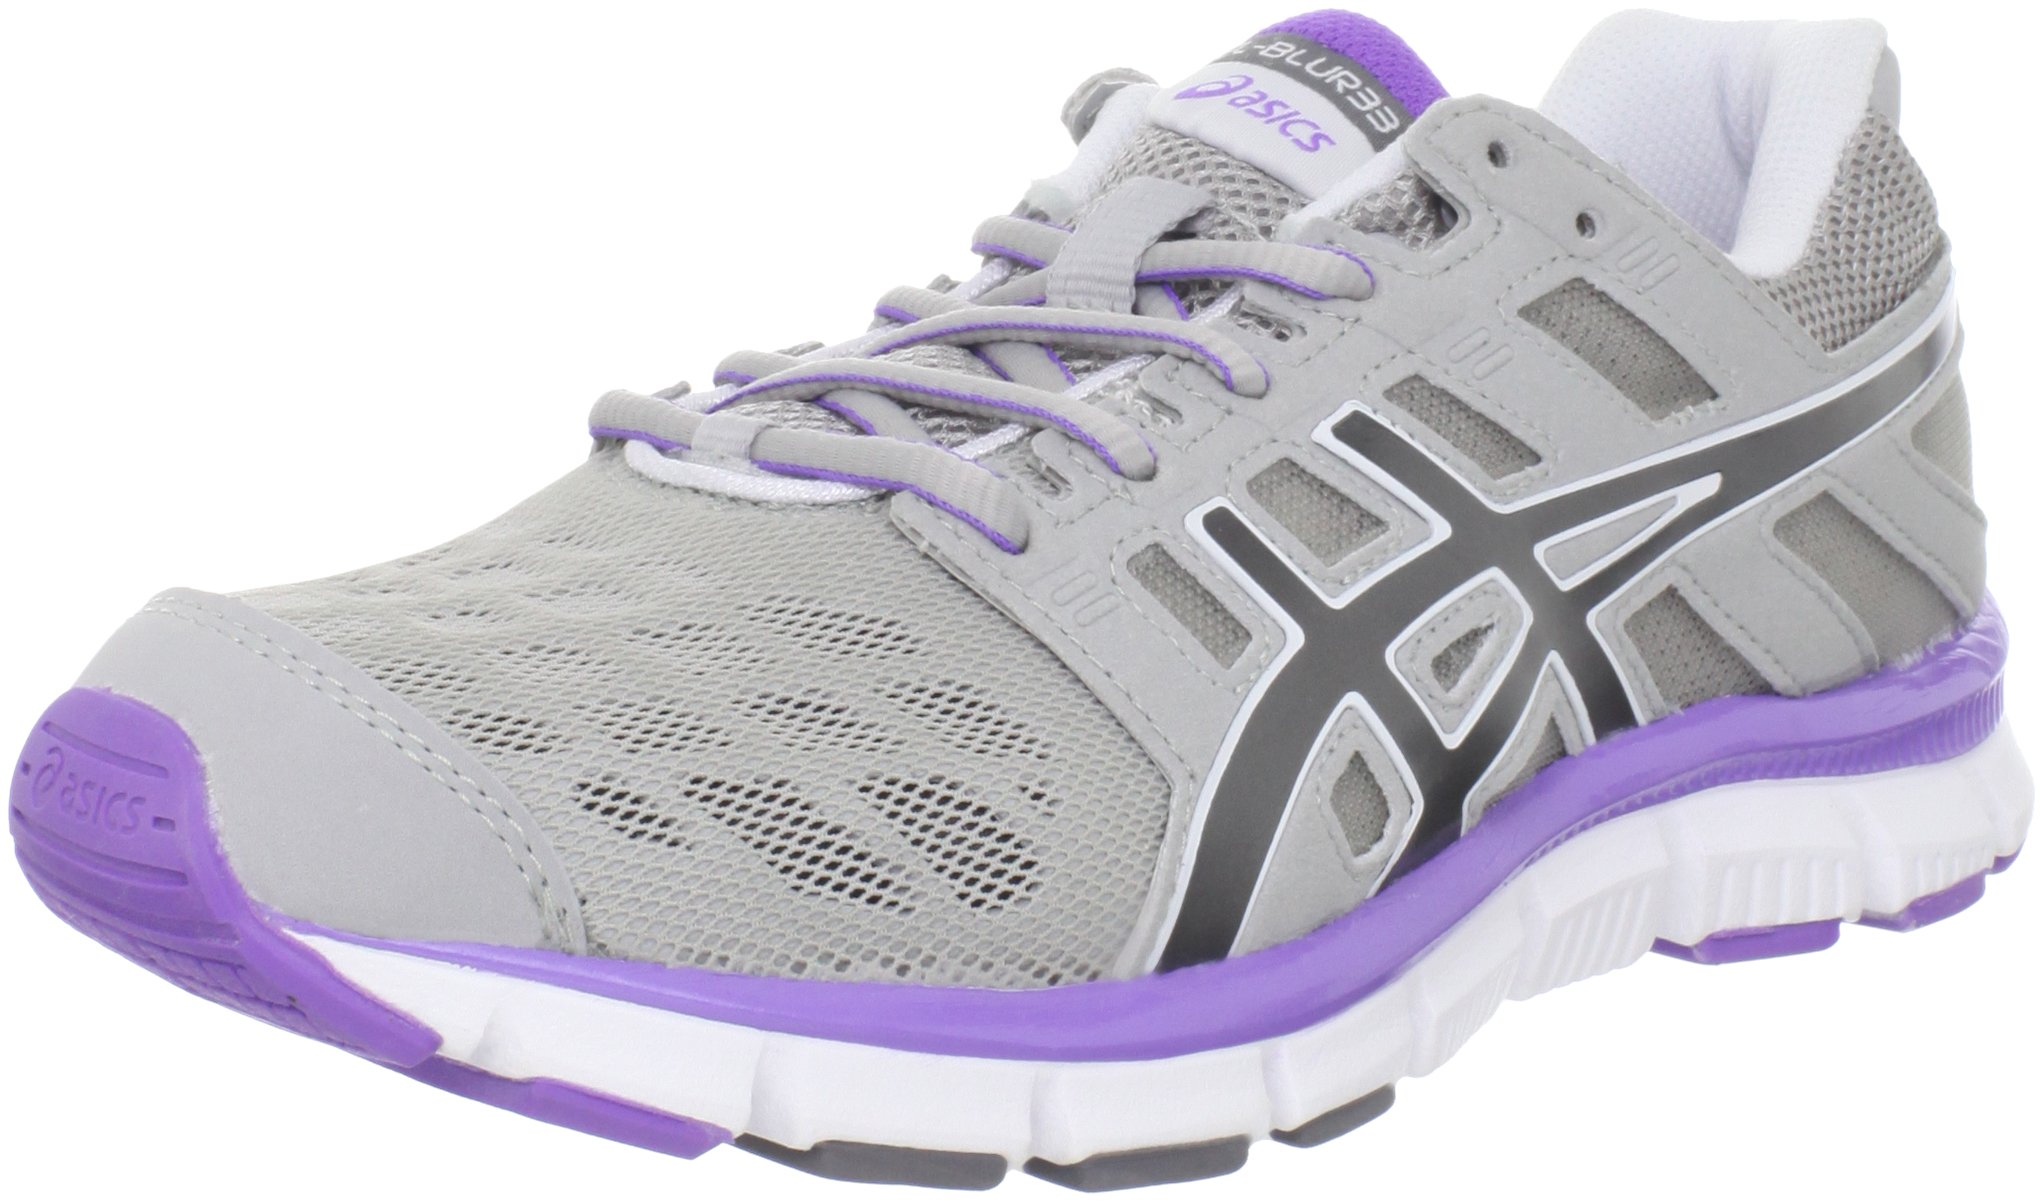 ASICS Women's GEL-Blur 33 TR Cross-Training Shoe,Silver/Titanium/Neon Purple,12 M US